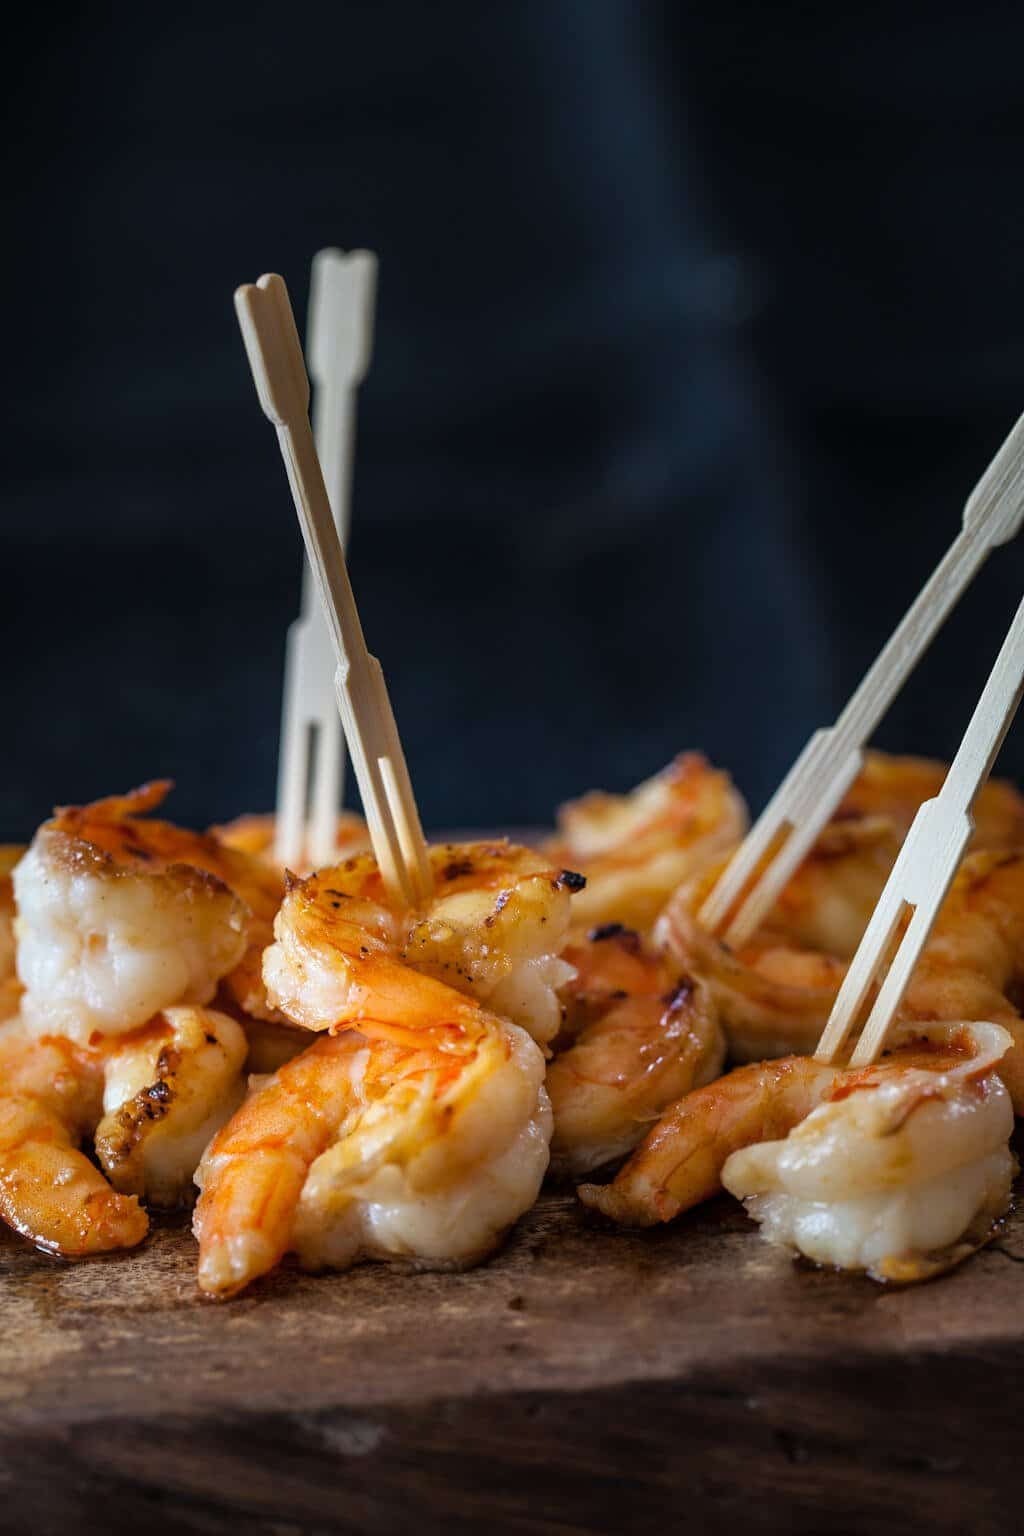 Miso Butter Shrimp on table